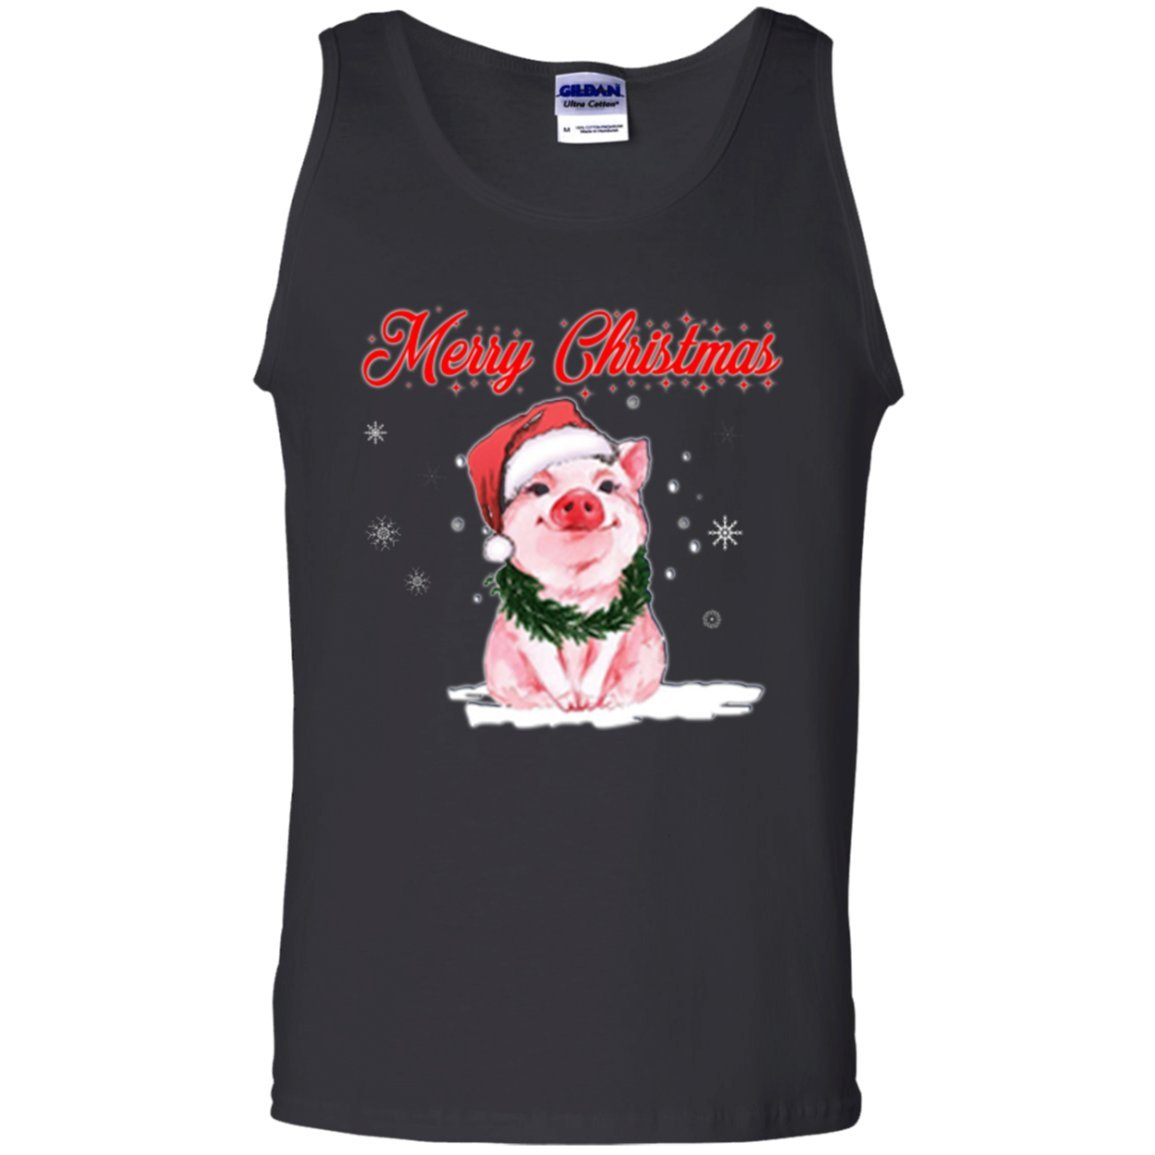 Vinteena Merry Christmas Love Pigs Unisex Tanktop Tshirt